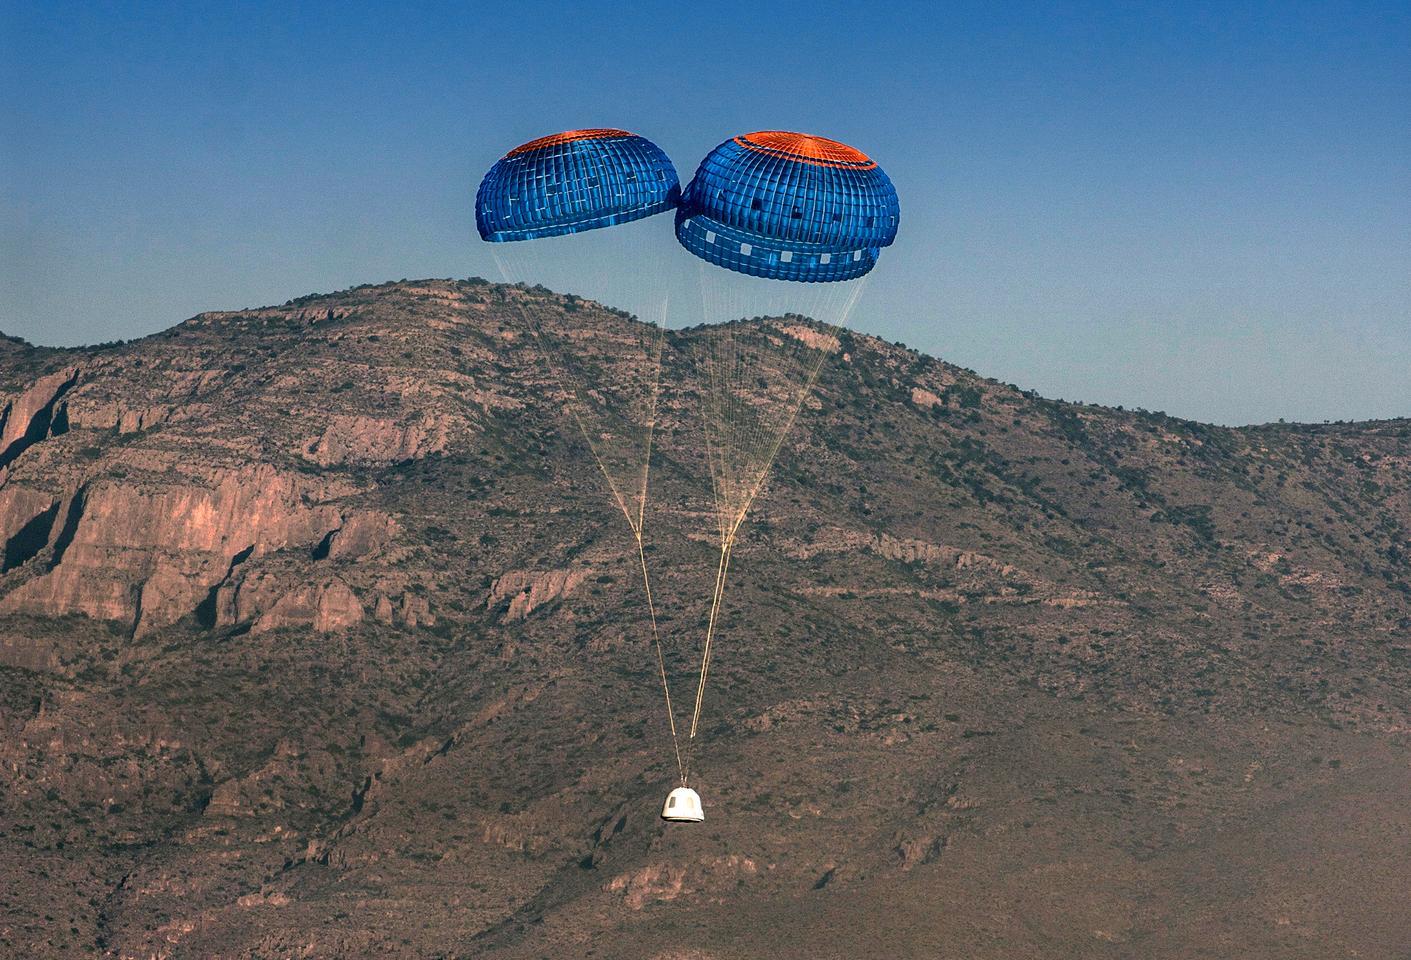 The New Sheperd crew capsule lands safely (Photo: Blue Origin)